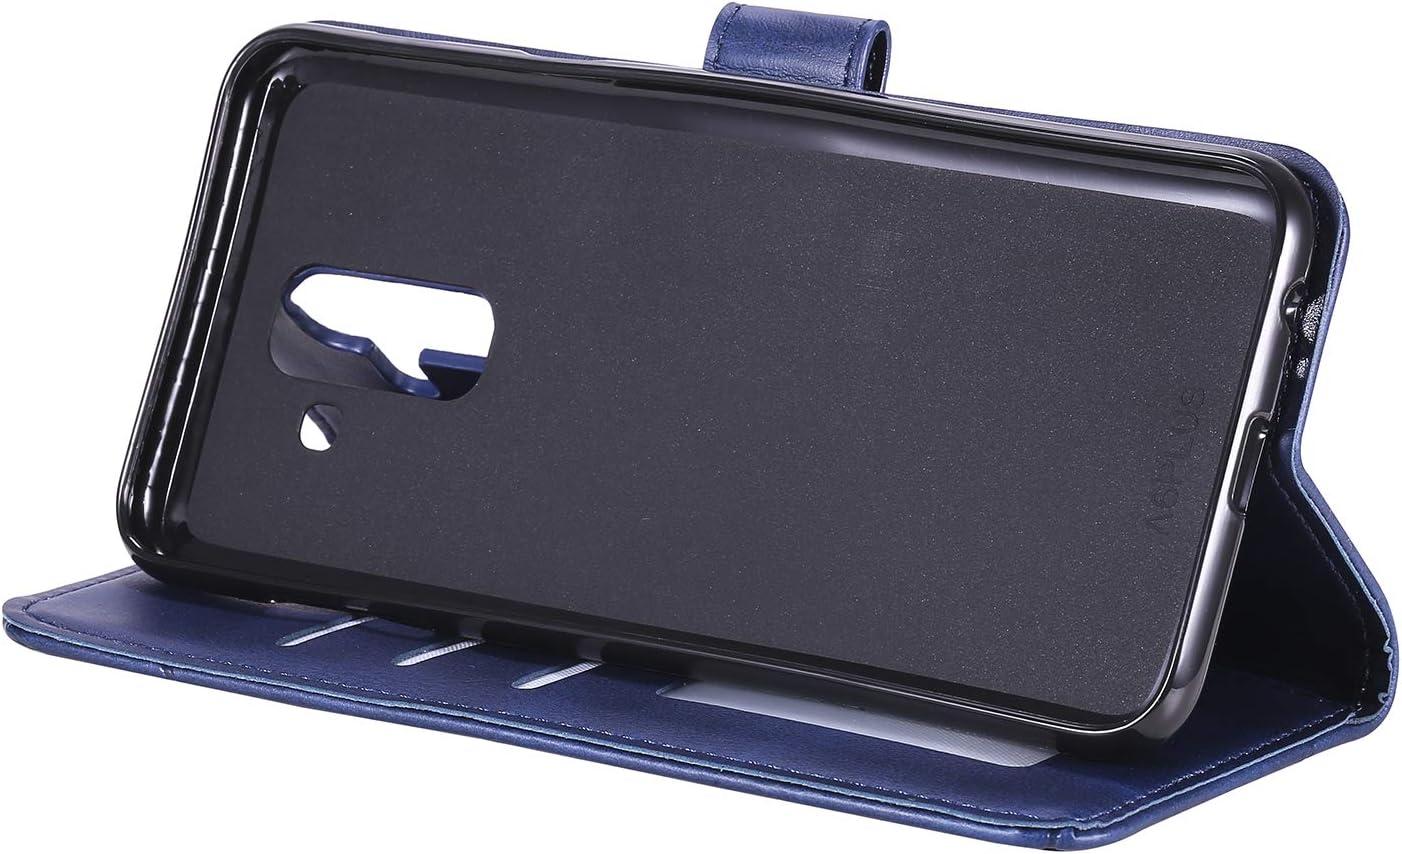 H/ülle Leder Case mit Standfunktion Magnetverschluss Flipcase Klapph/ülle kompatibel mit Samsung Galaxy A6+ 2018 Docrax Galaxy A6+ DOHHA150441 Blau Handyh/ülle A6 Plus